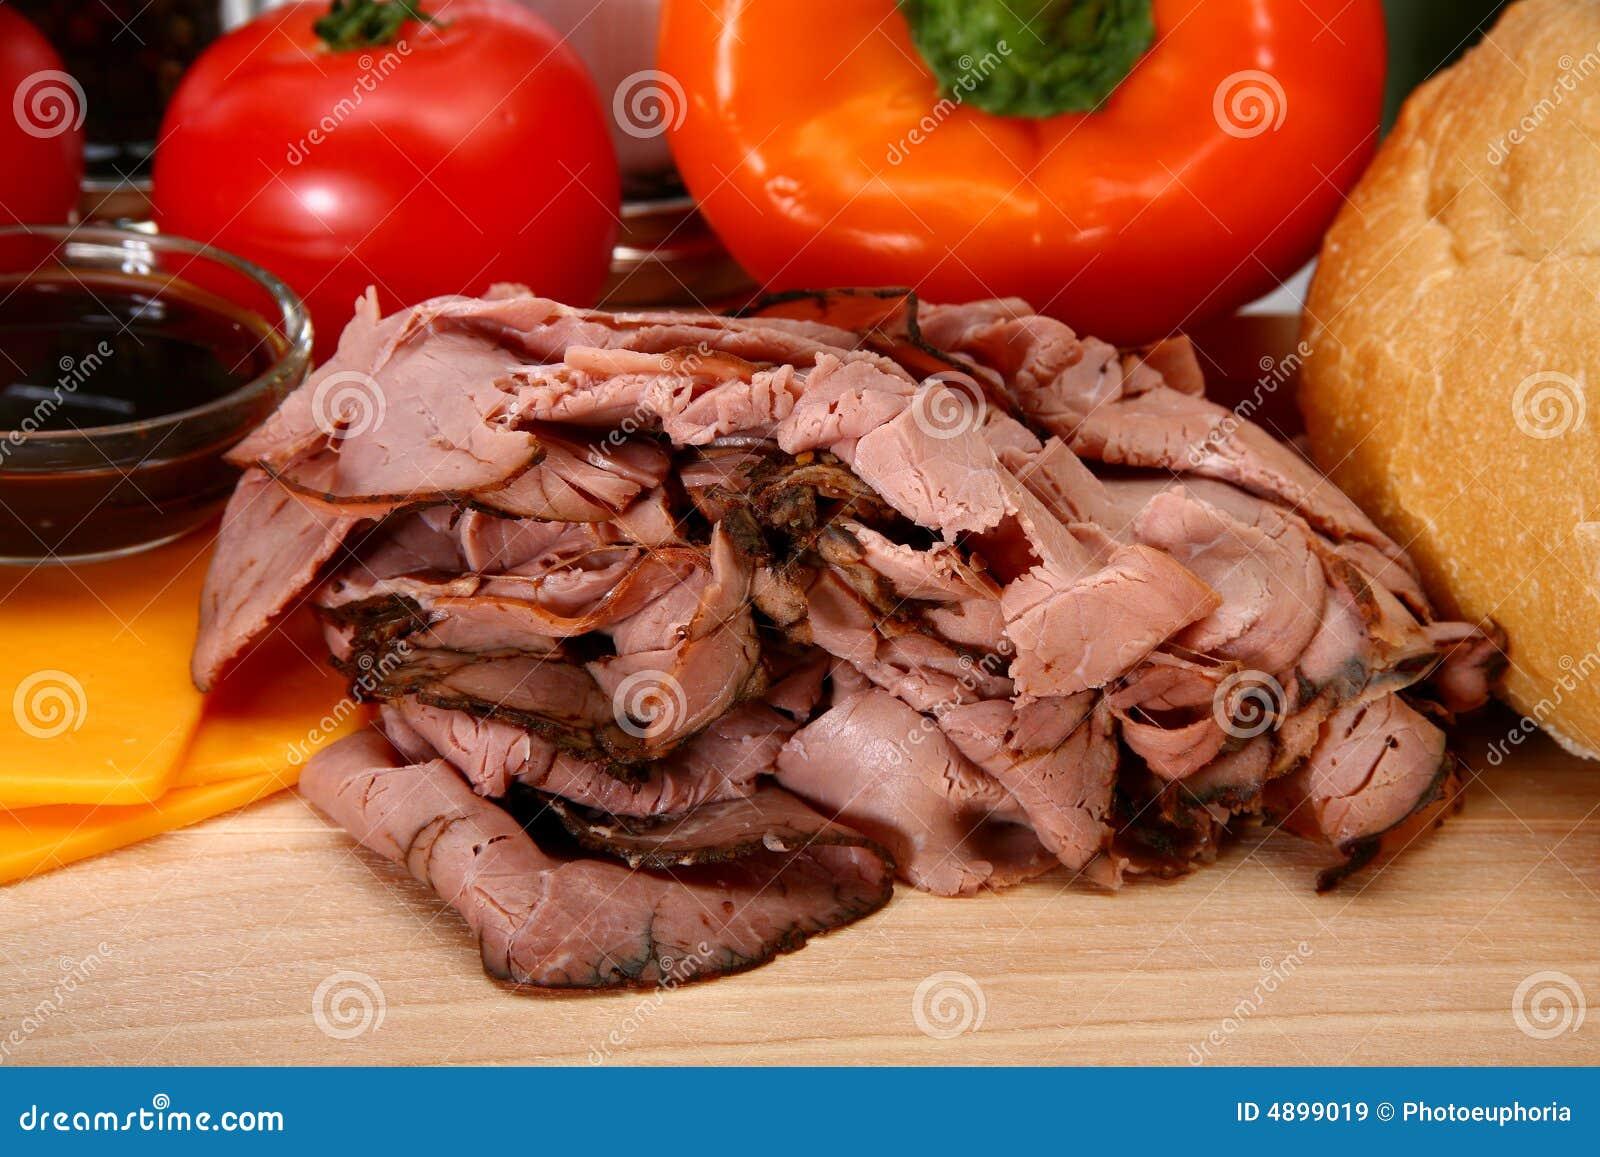 how to cook deli sliced roast beef